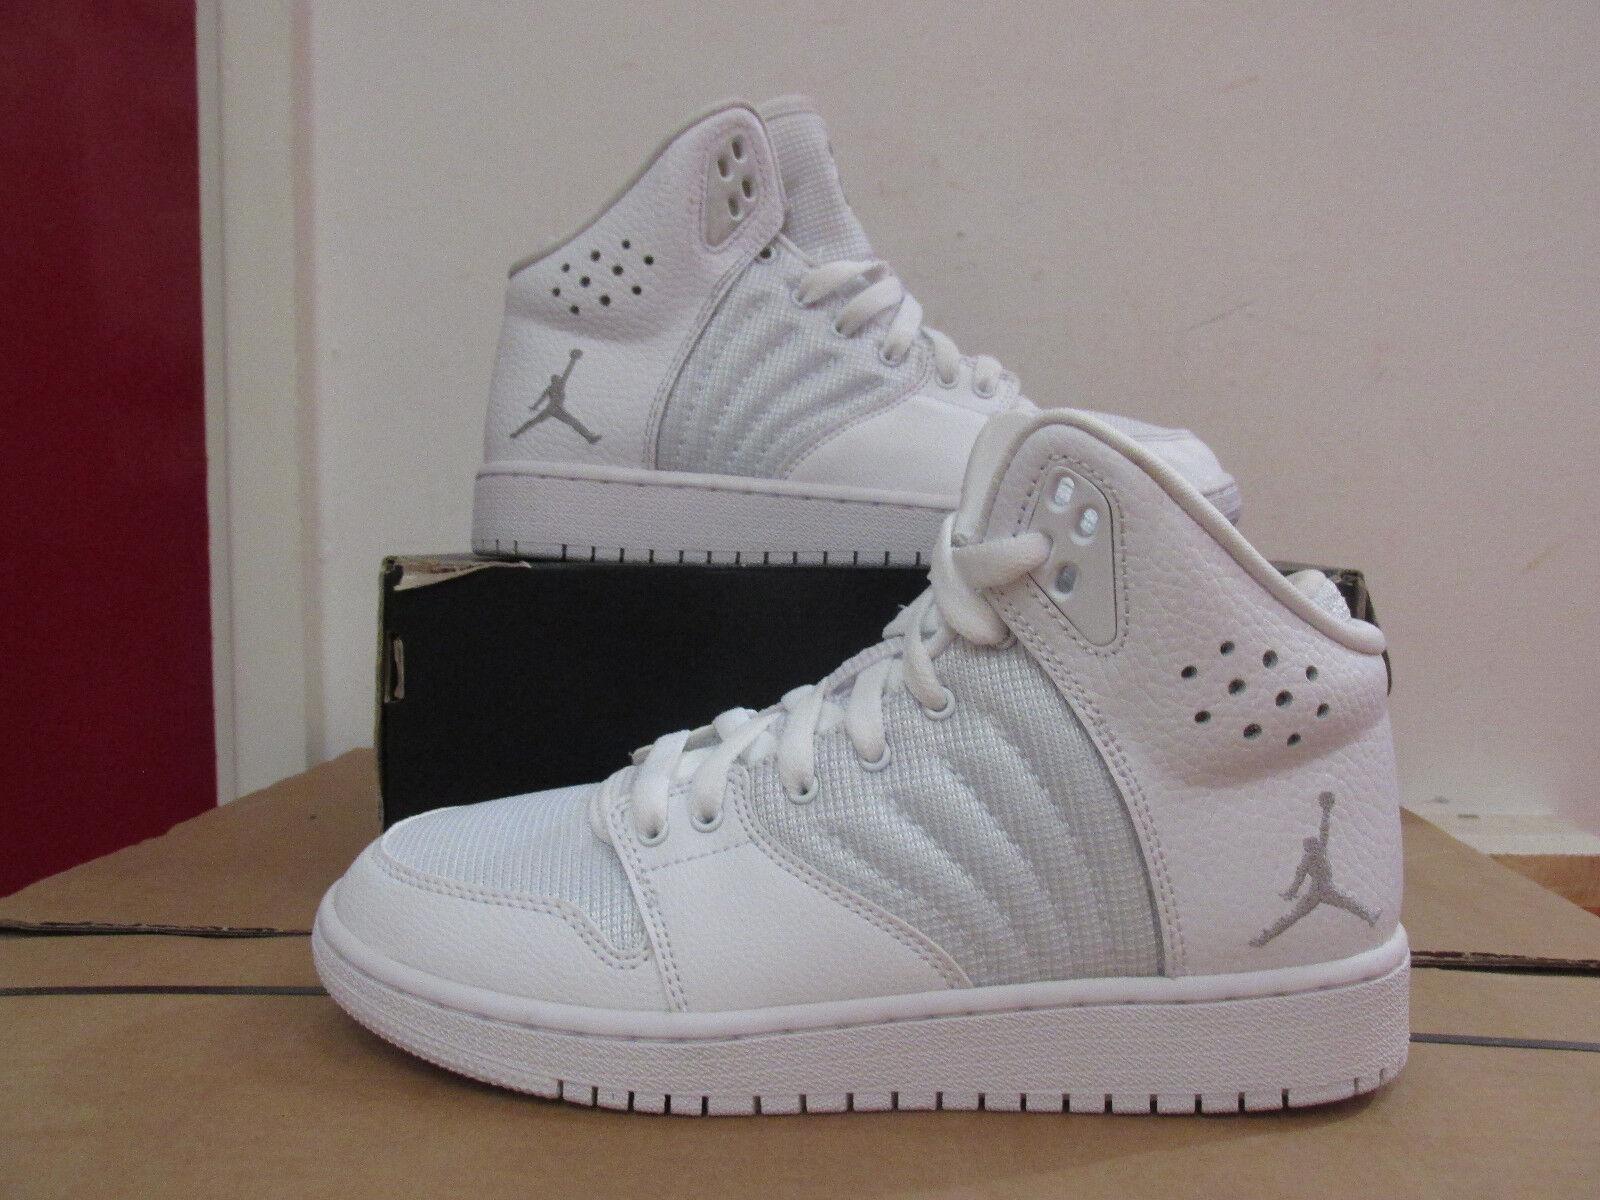 362d25f29ad7f0 Nike Air Jordan 1 Flight 4 BG Hi Top Basketball Trainers 820136 100 ...